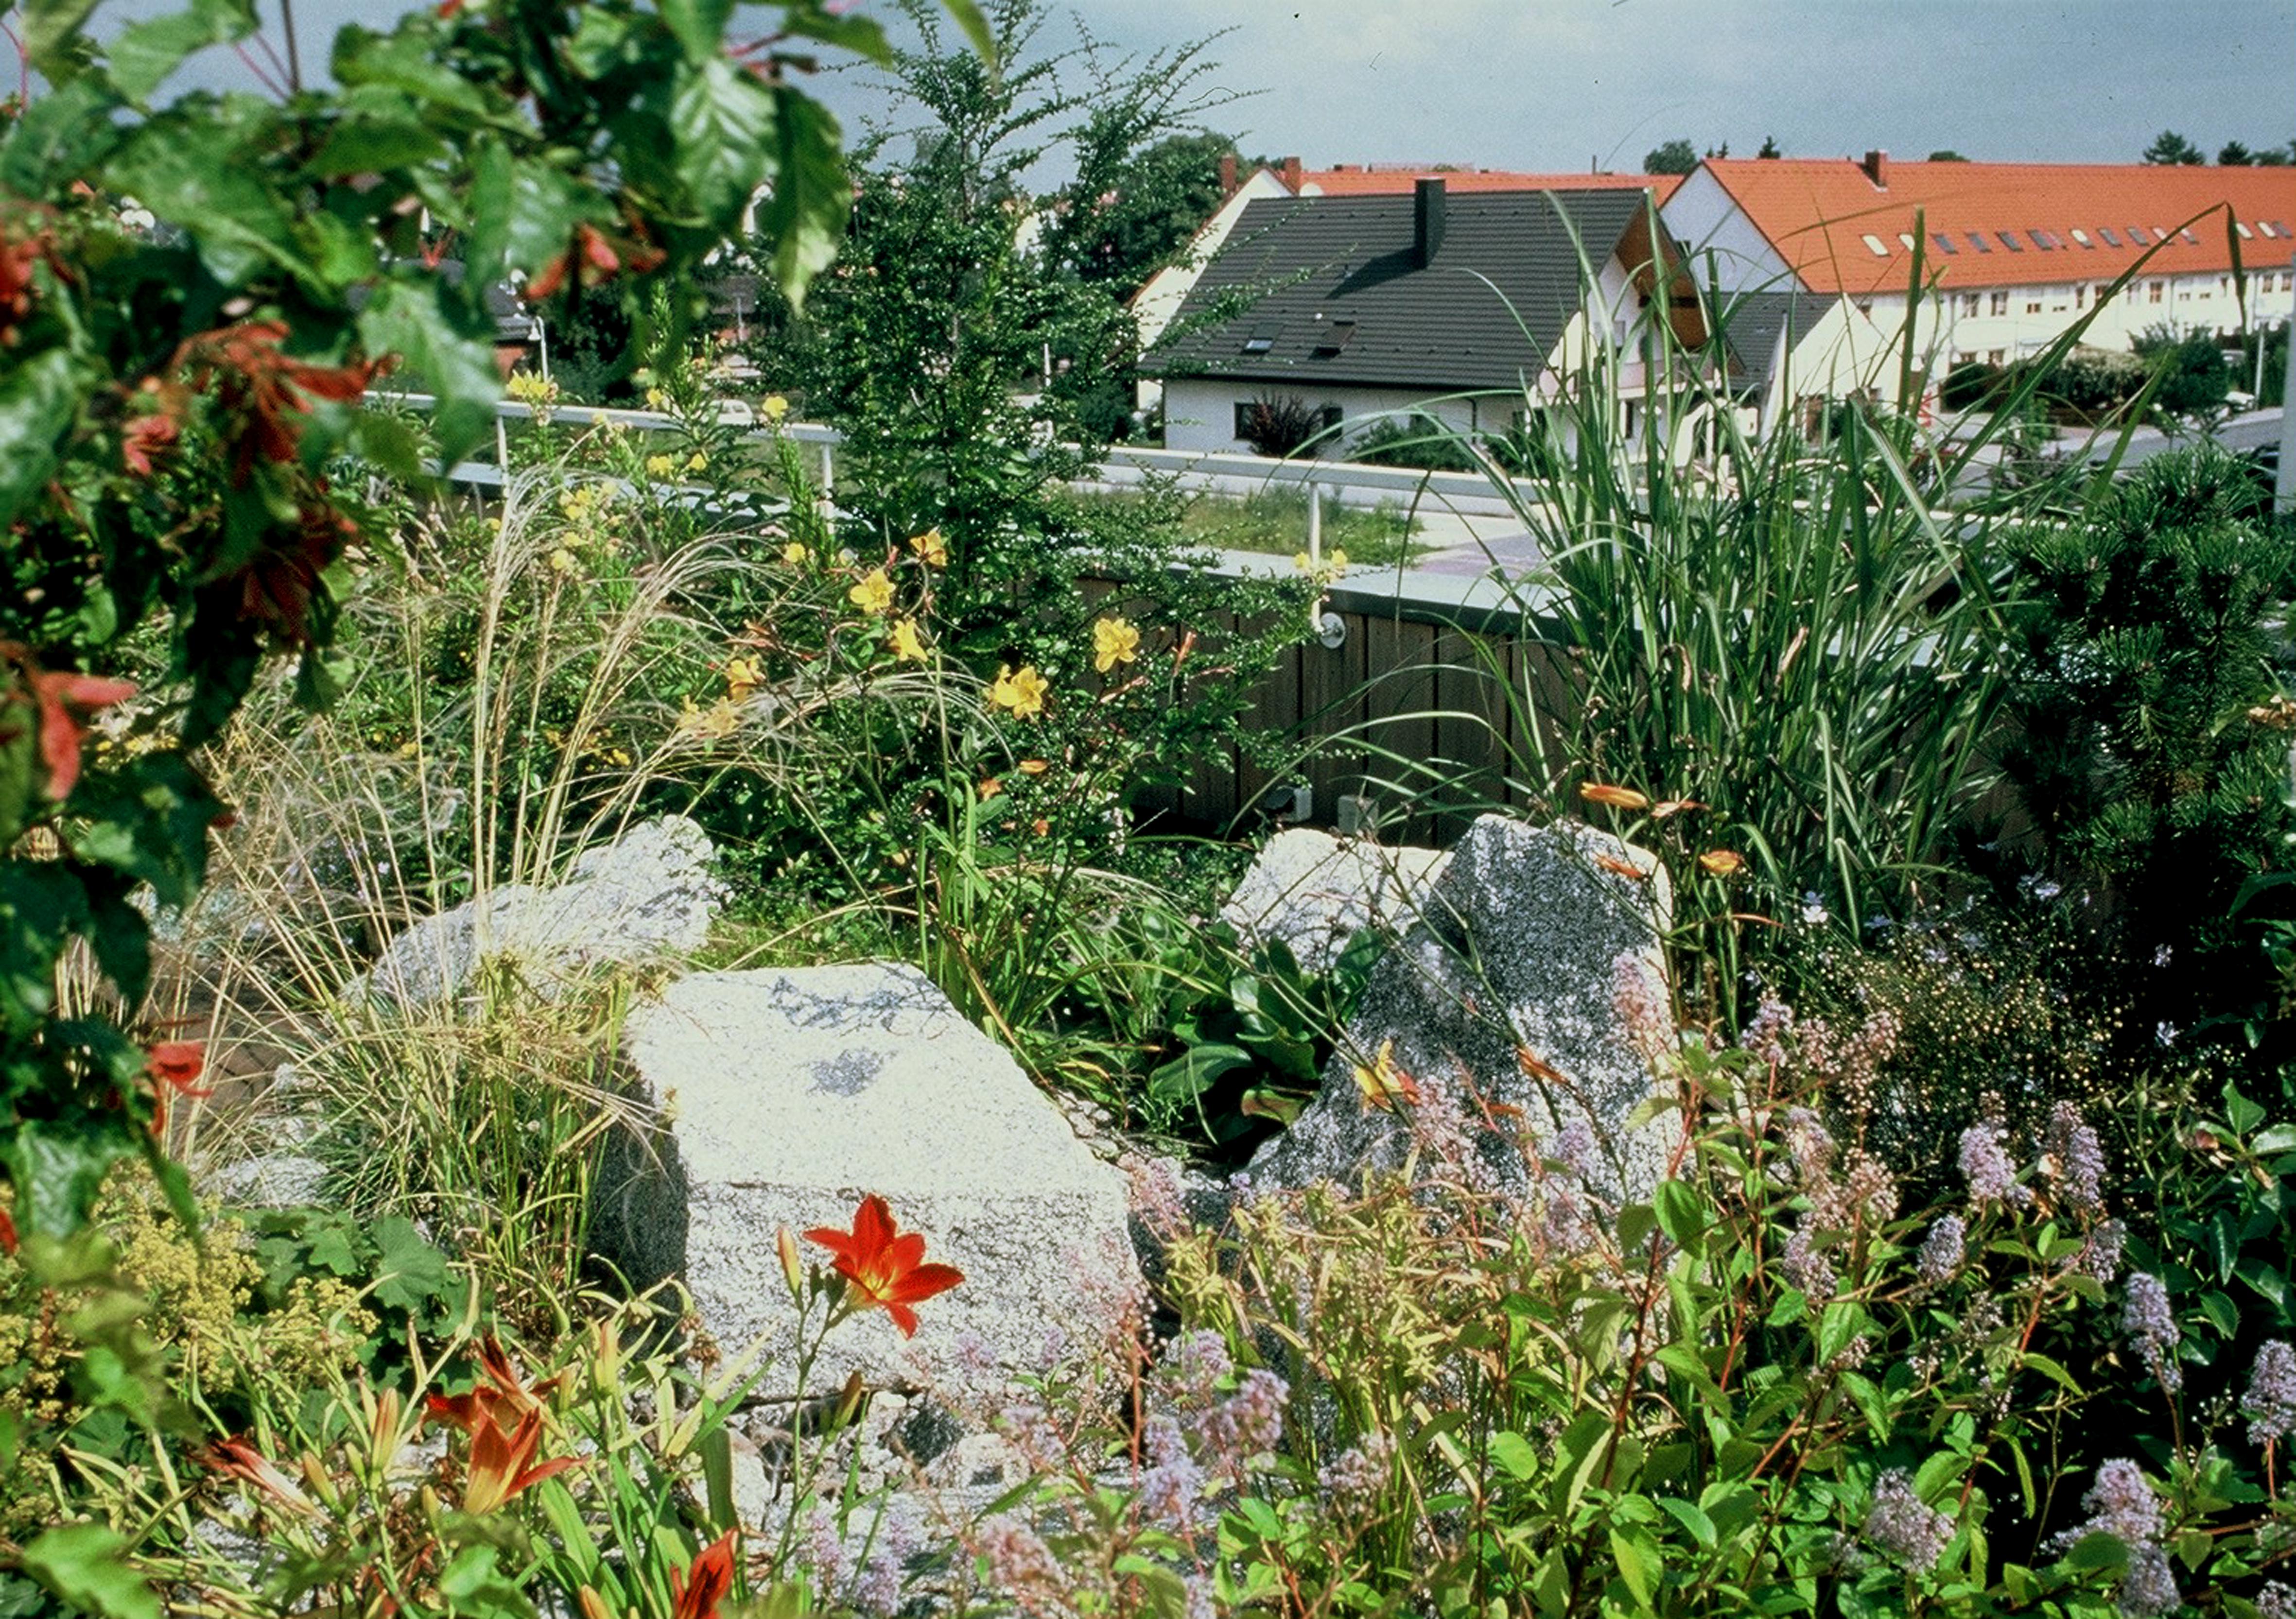 Acoperisuri cu vegetatie extensiva, intensiva BAUDER - Poza 37